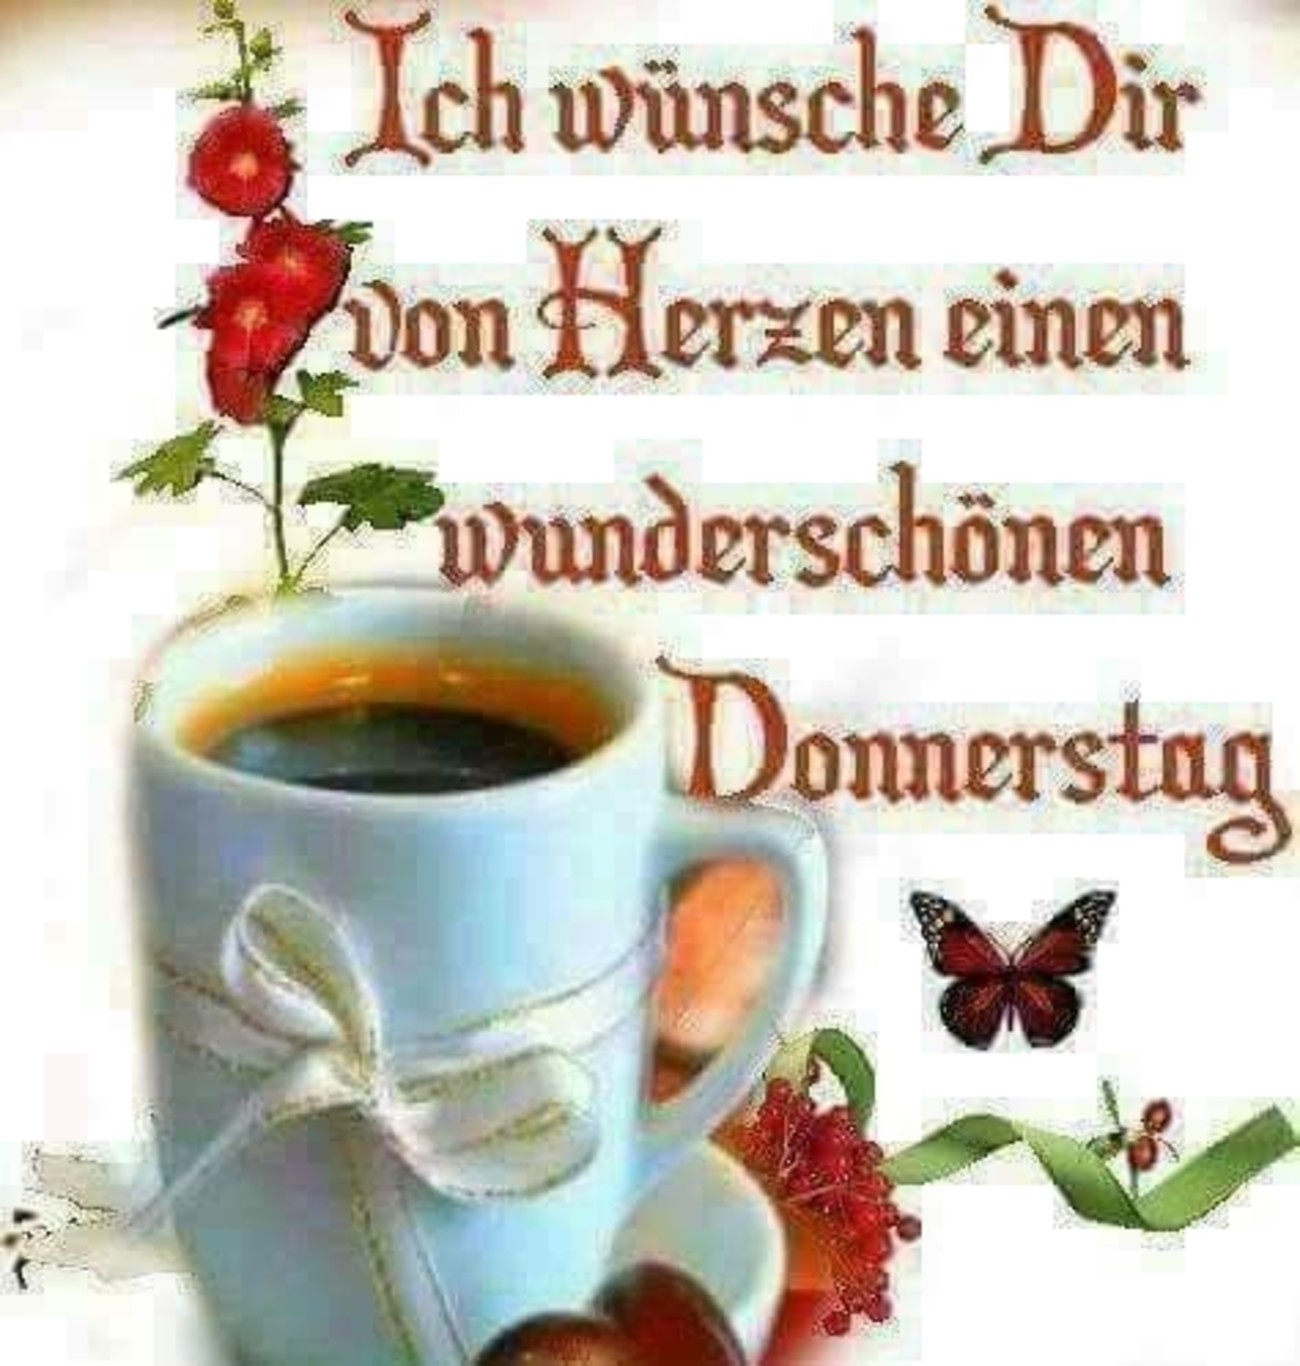 Donnerstagsgruß Guten Morgen Donnerstag Gif Morgen